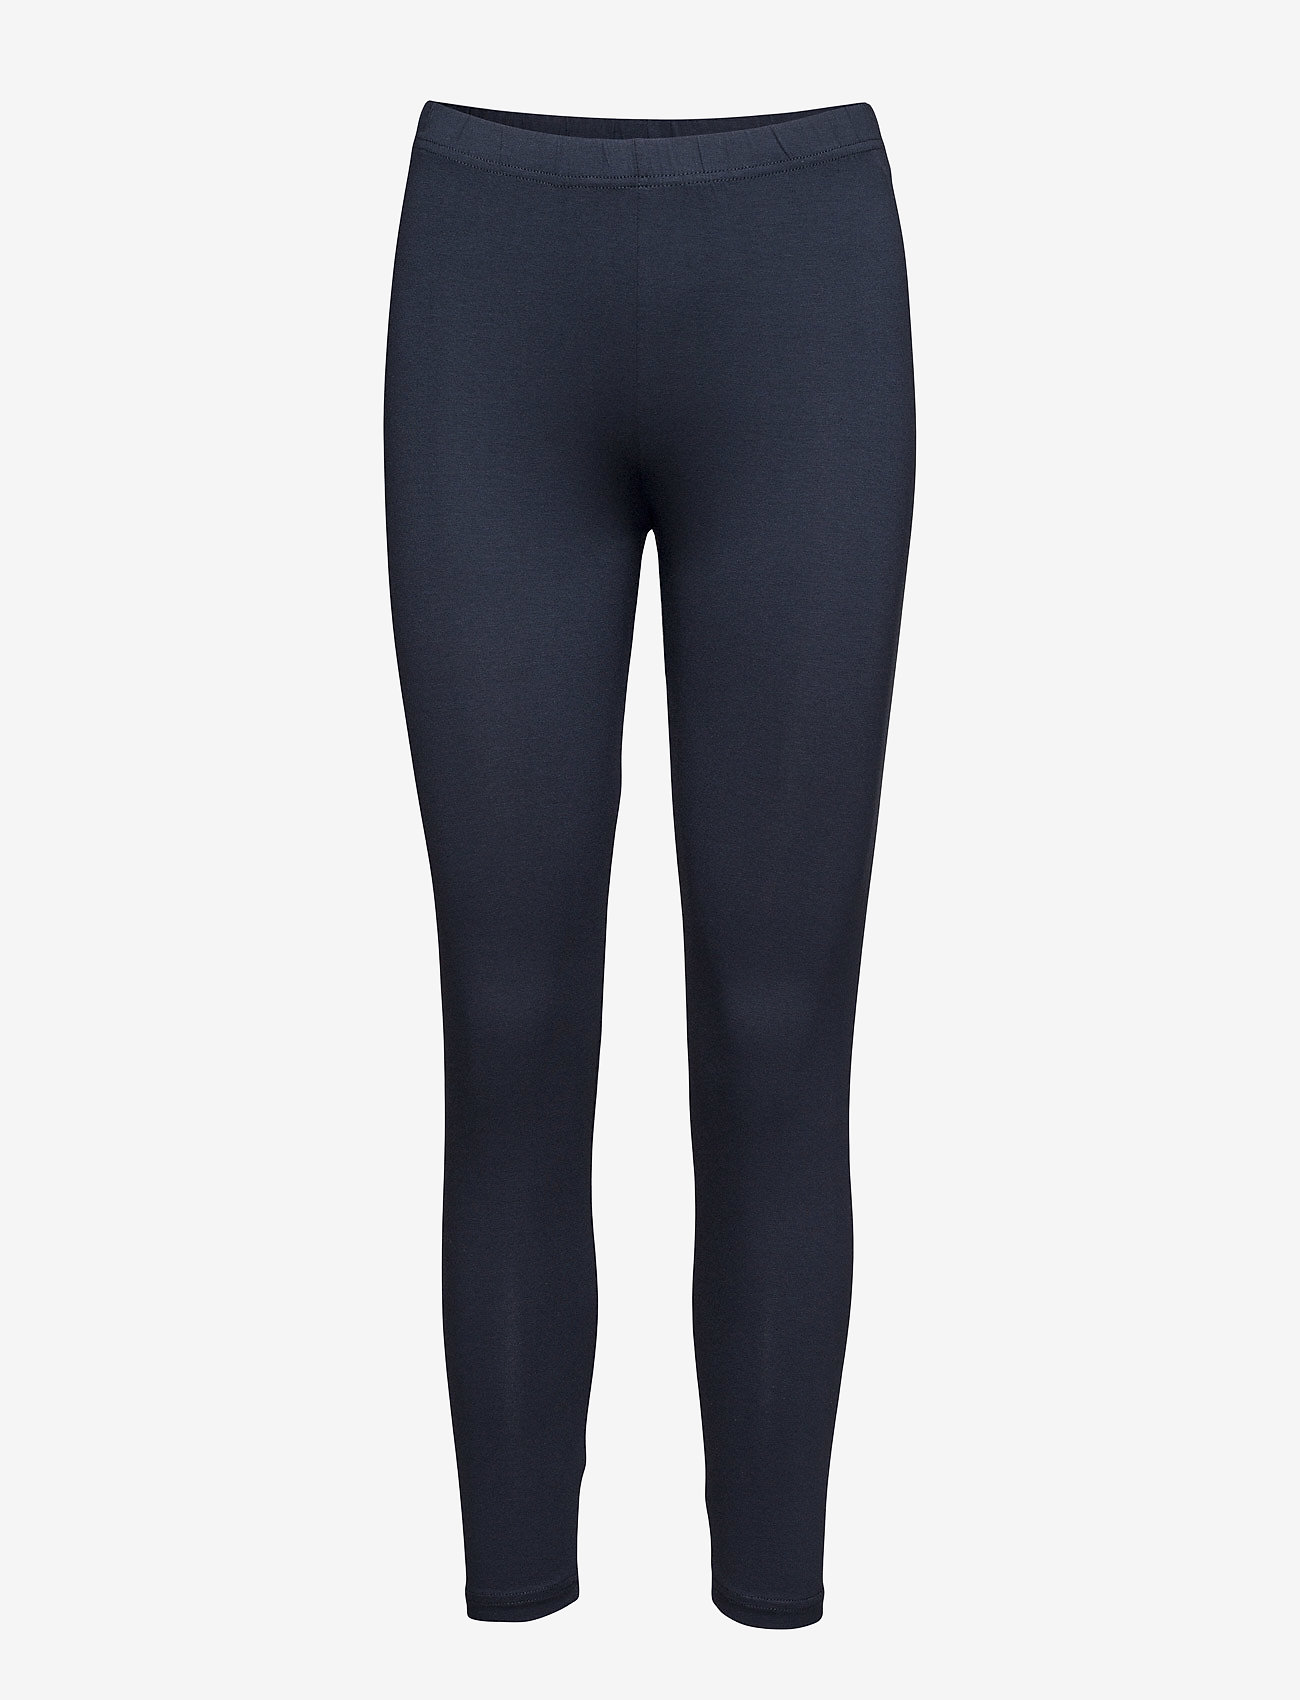 Masai - Pia - leggings - navy - 0